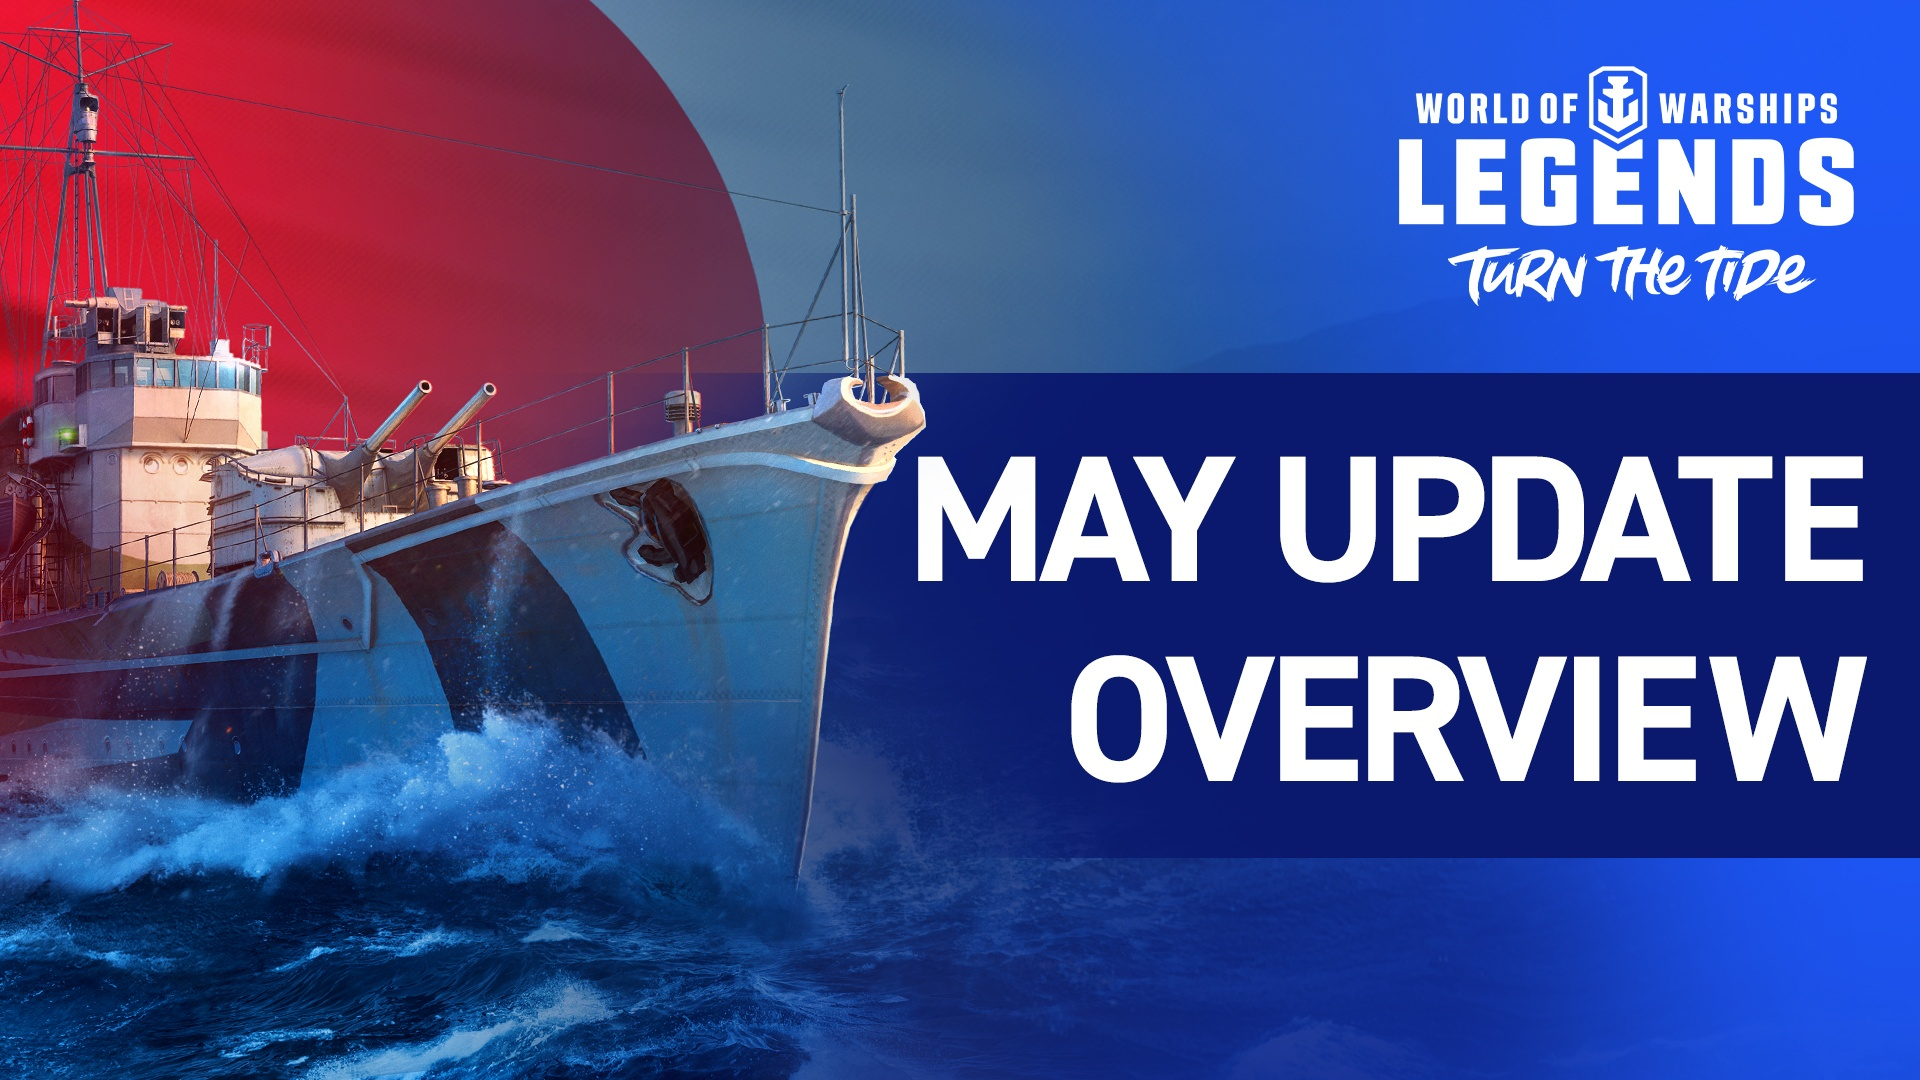 World of Warships: Legends Unleashes Legendary Tier Ships